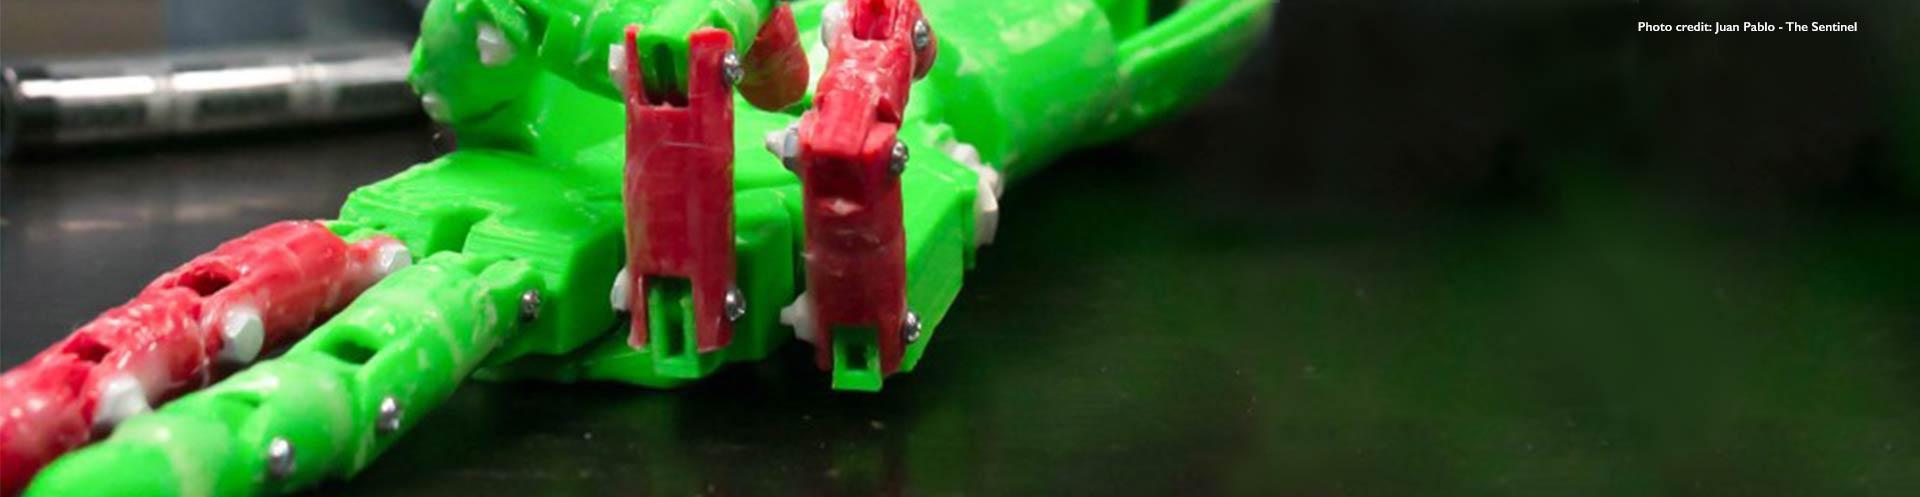 Mechatronics engineering student creates 3-D printed robotic hand